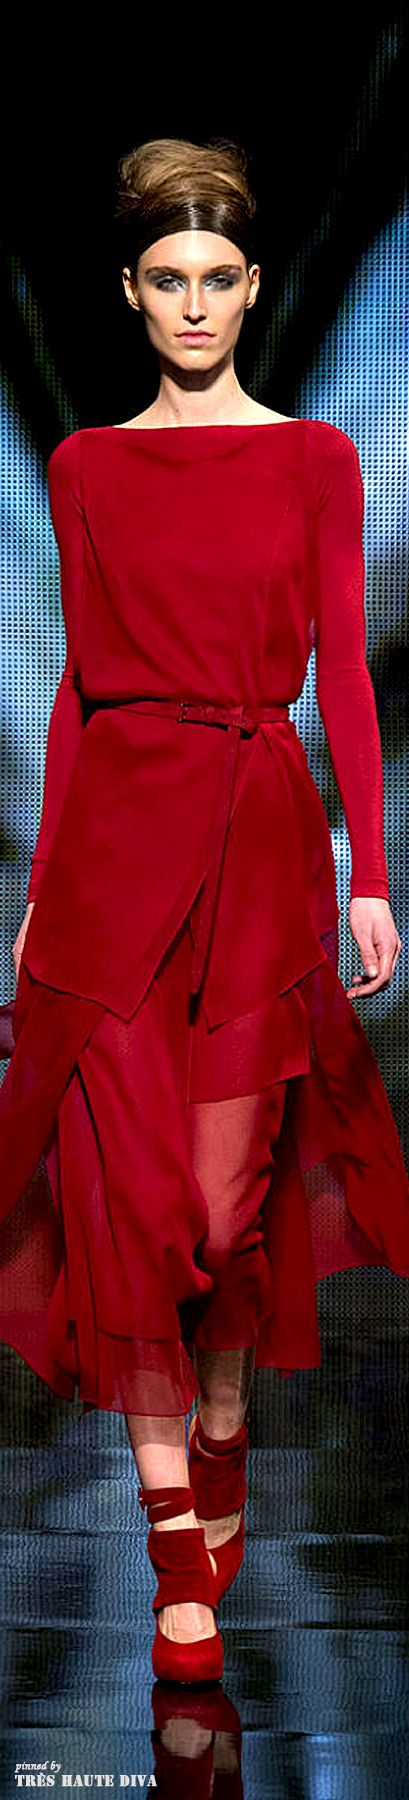 Donna Karan FW 2014-15 - New York Fashion Week | The House of Beccaria~